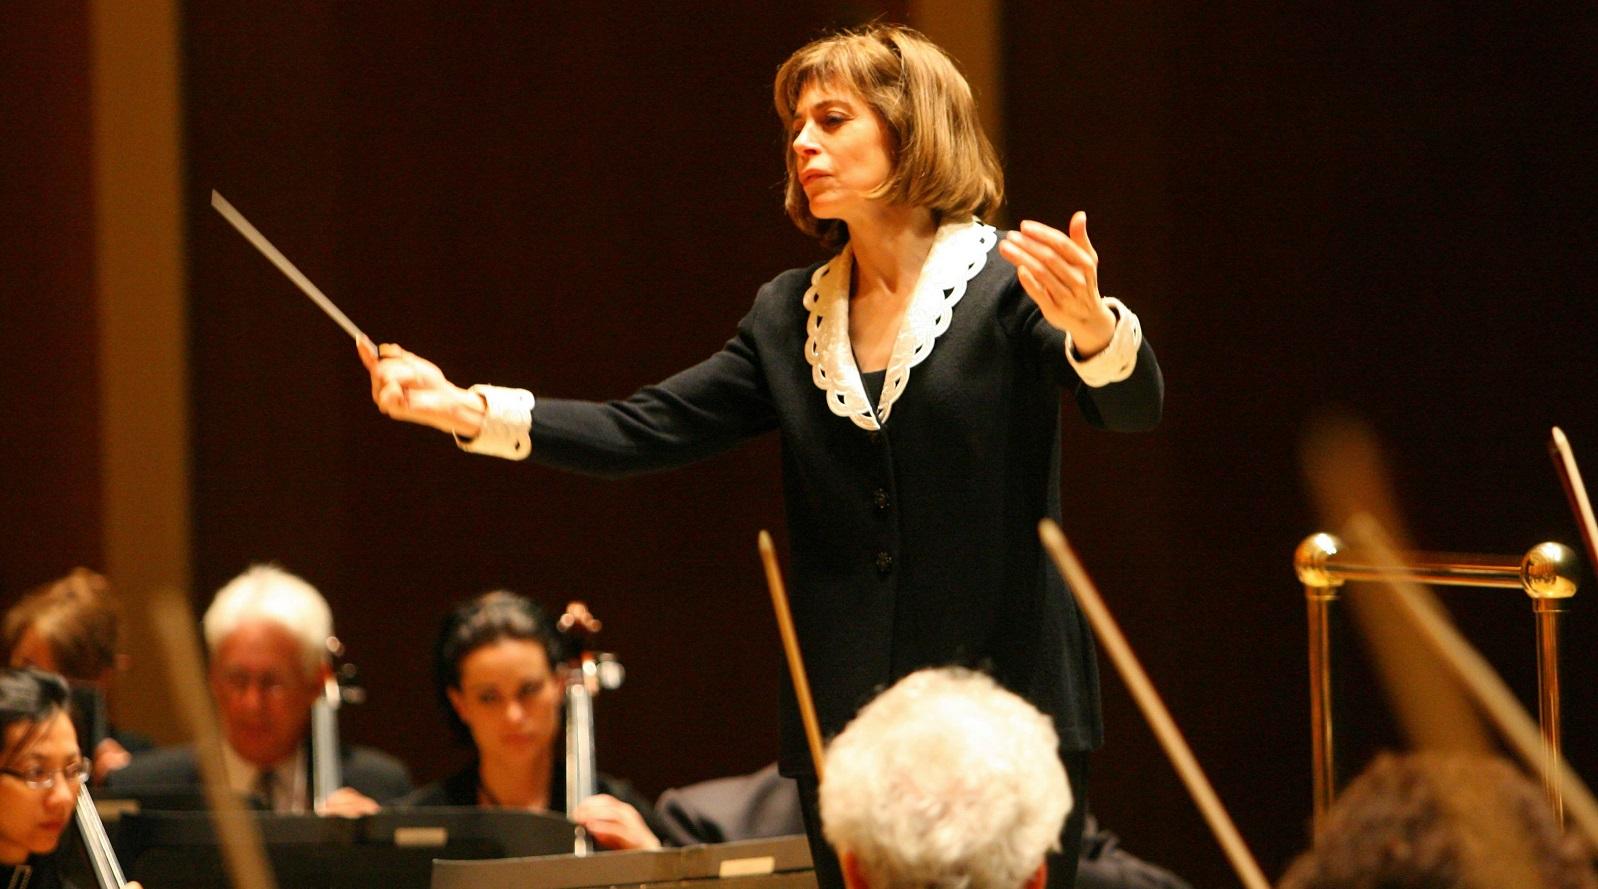 Conductor JoAnn Falletta and the Buffalo Philharmonic Orchestra. (Buffalo News file photo)